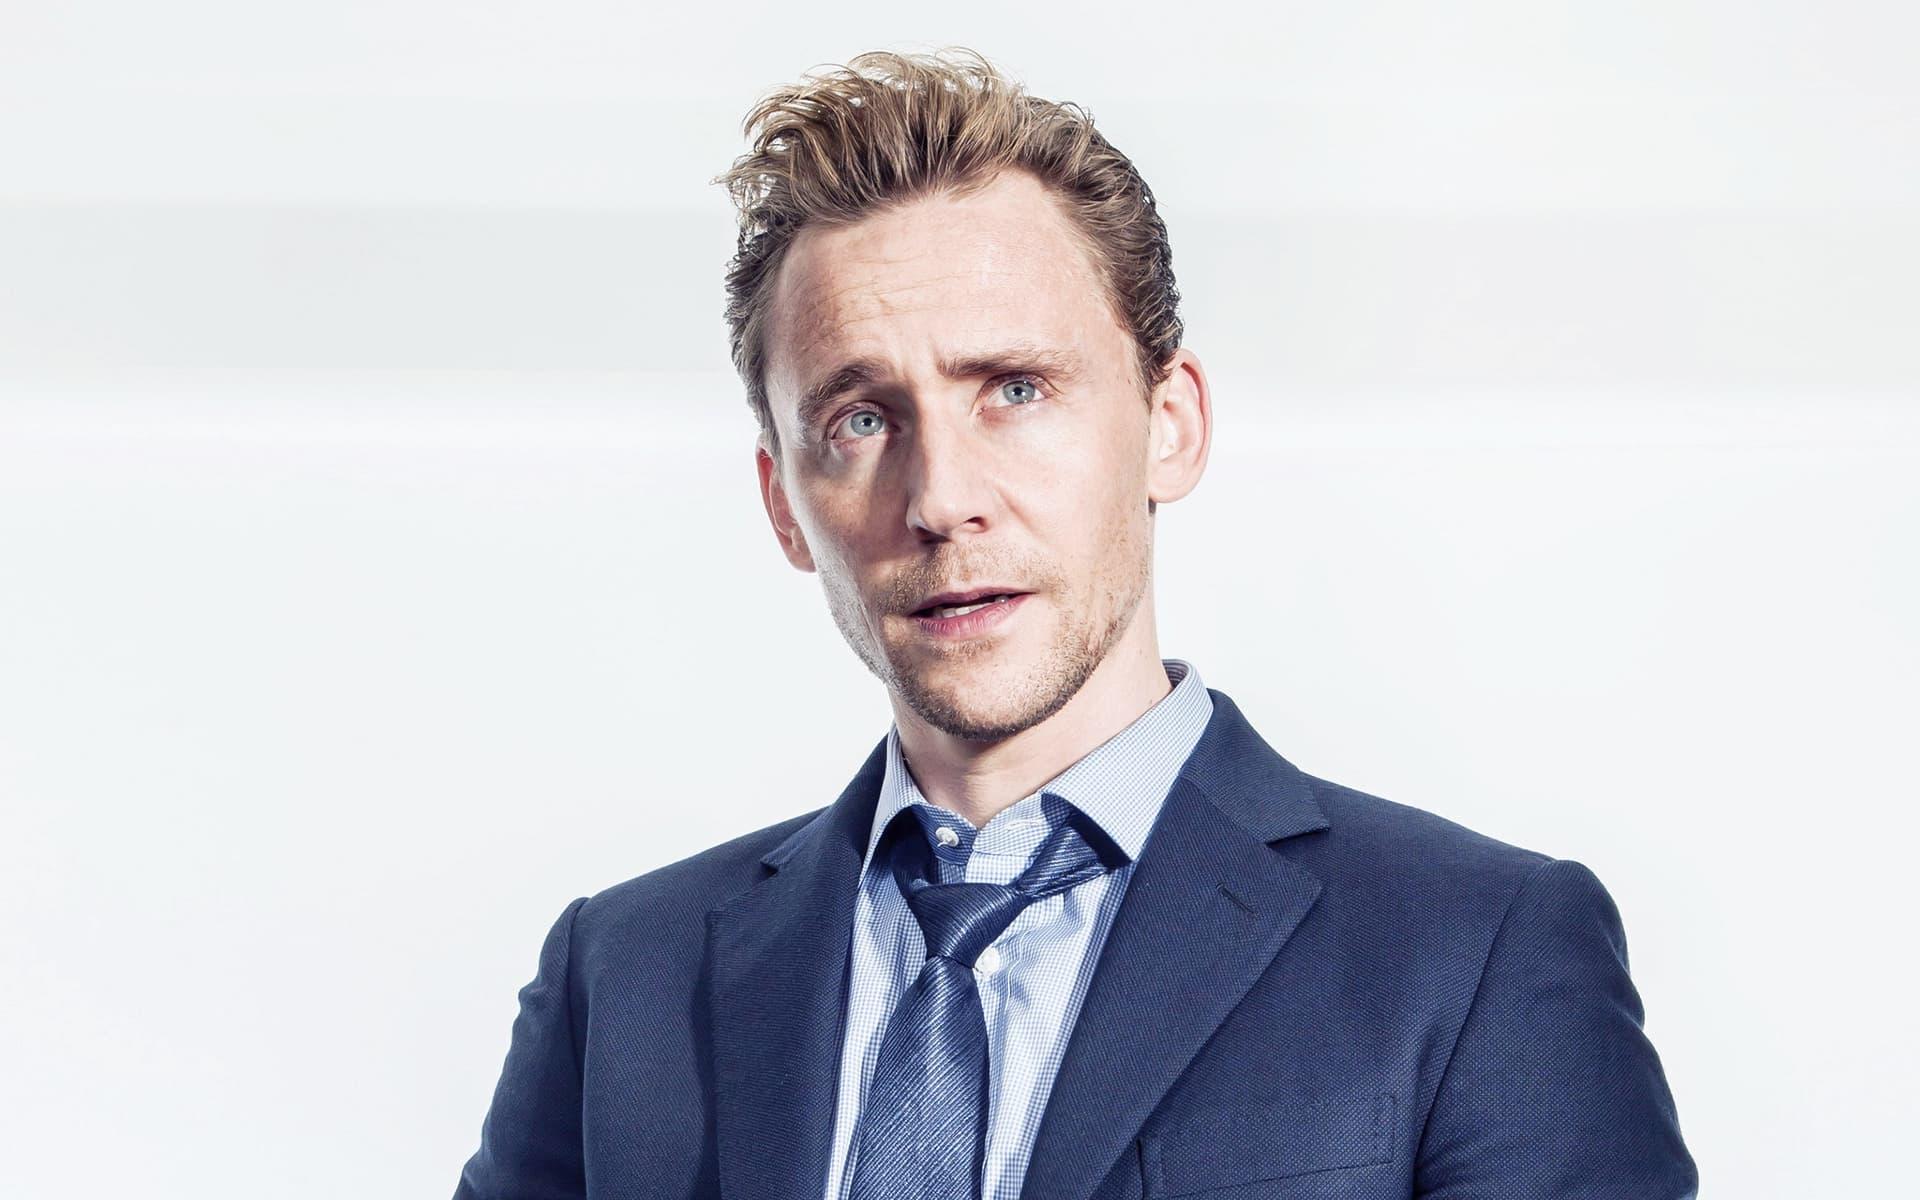 tom hiddleston actor desktop wallpaper 55673